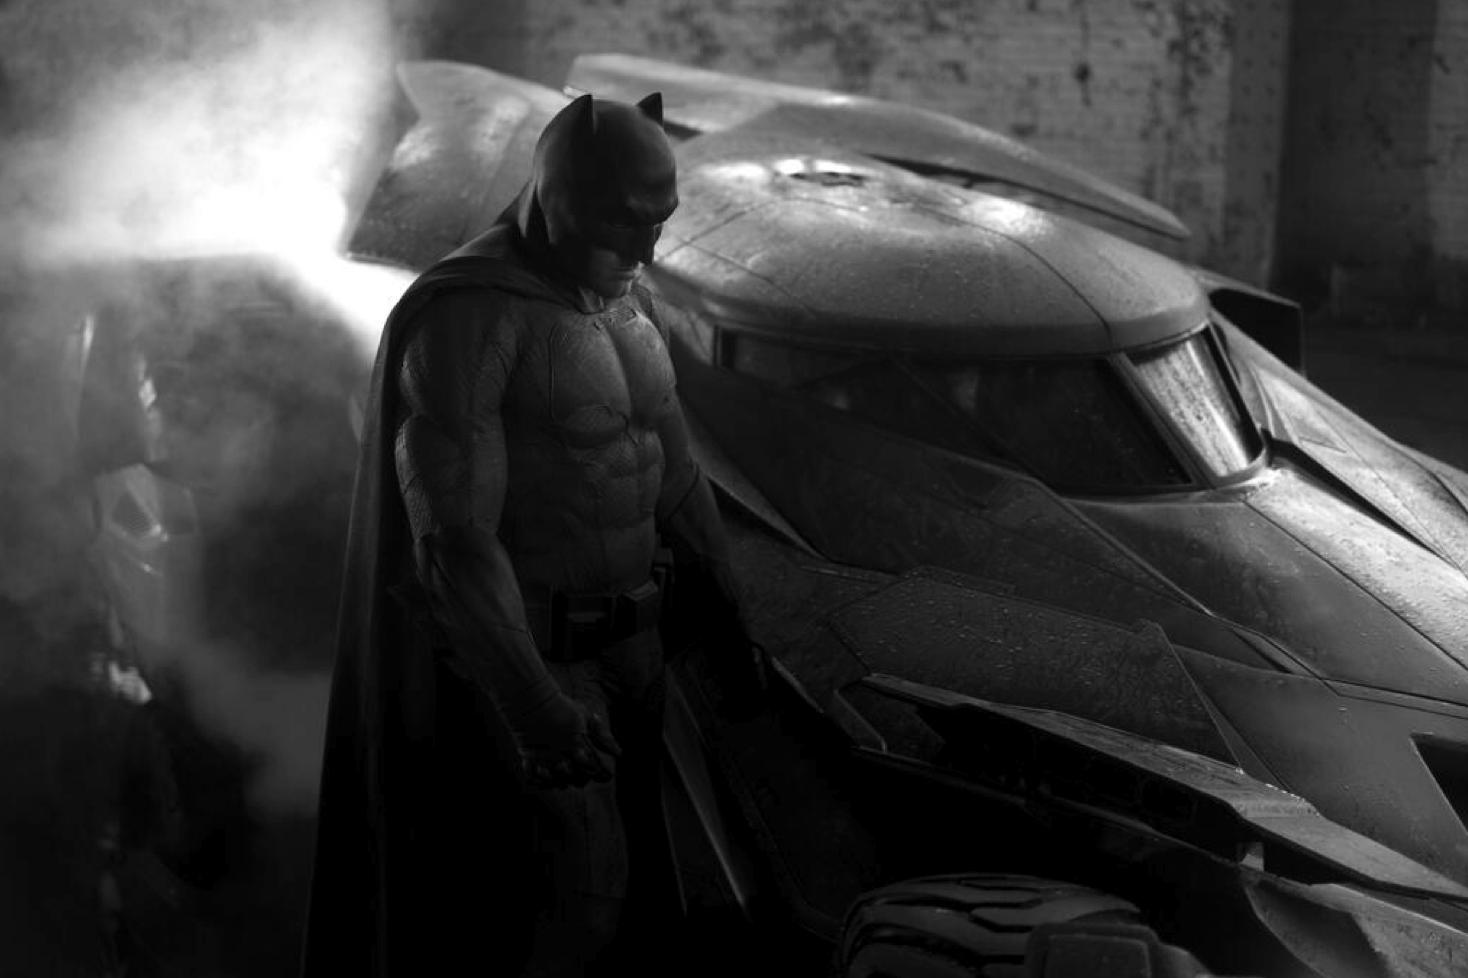 Ben Affleck as Batman - image via  Zack Snyder's Twitter.